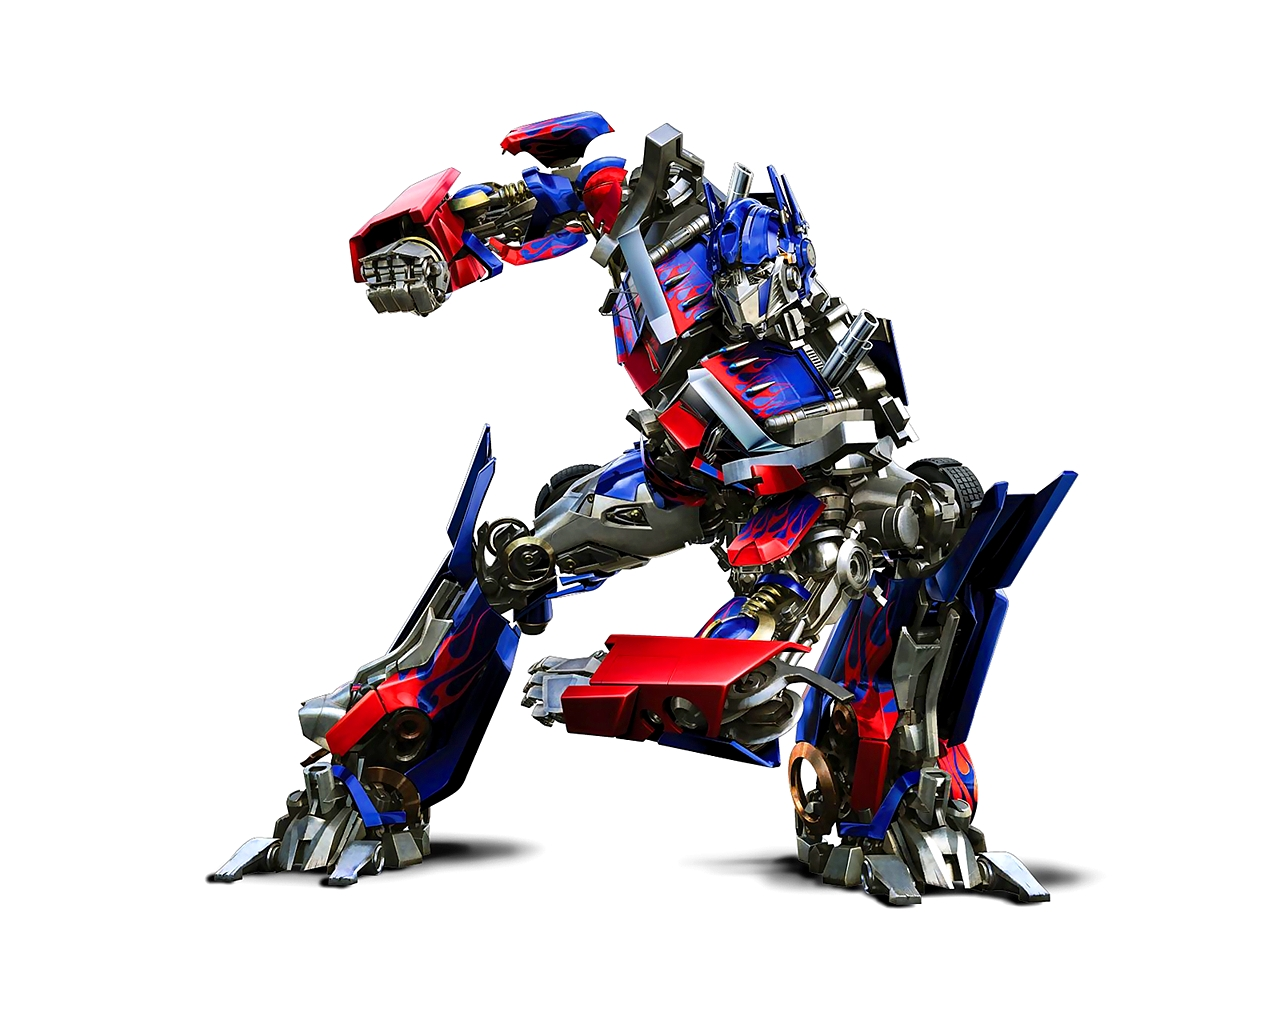 transformers2 optimus prime wallpaper 4 1280x1024